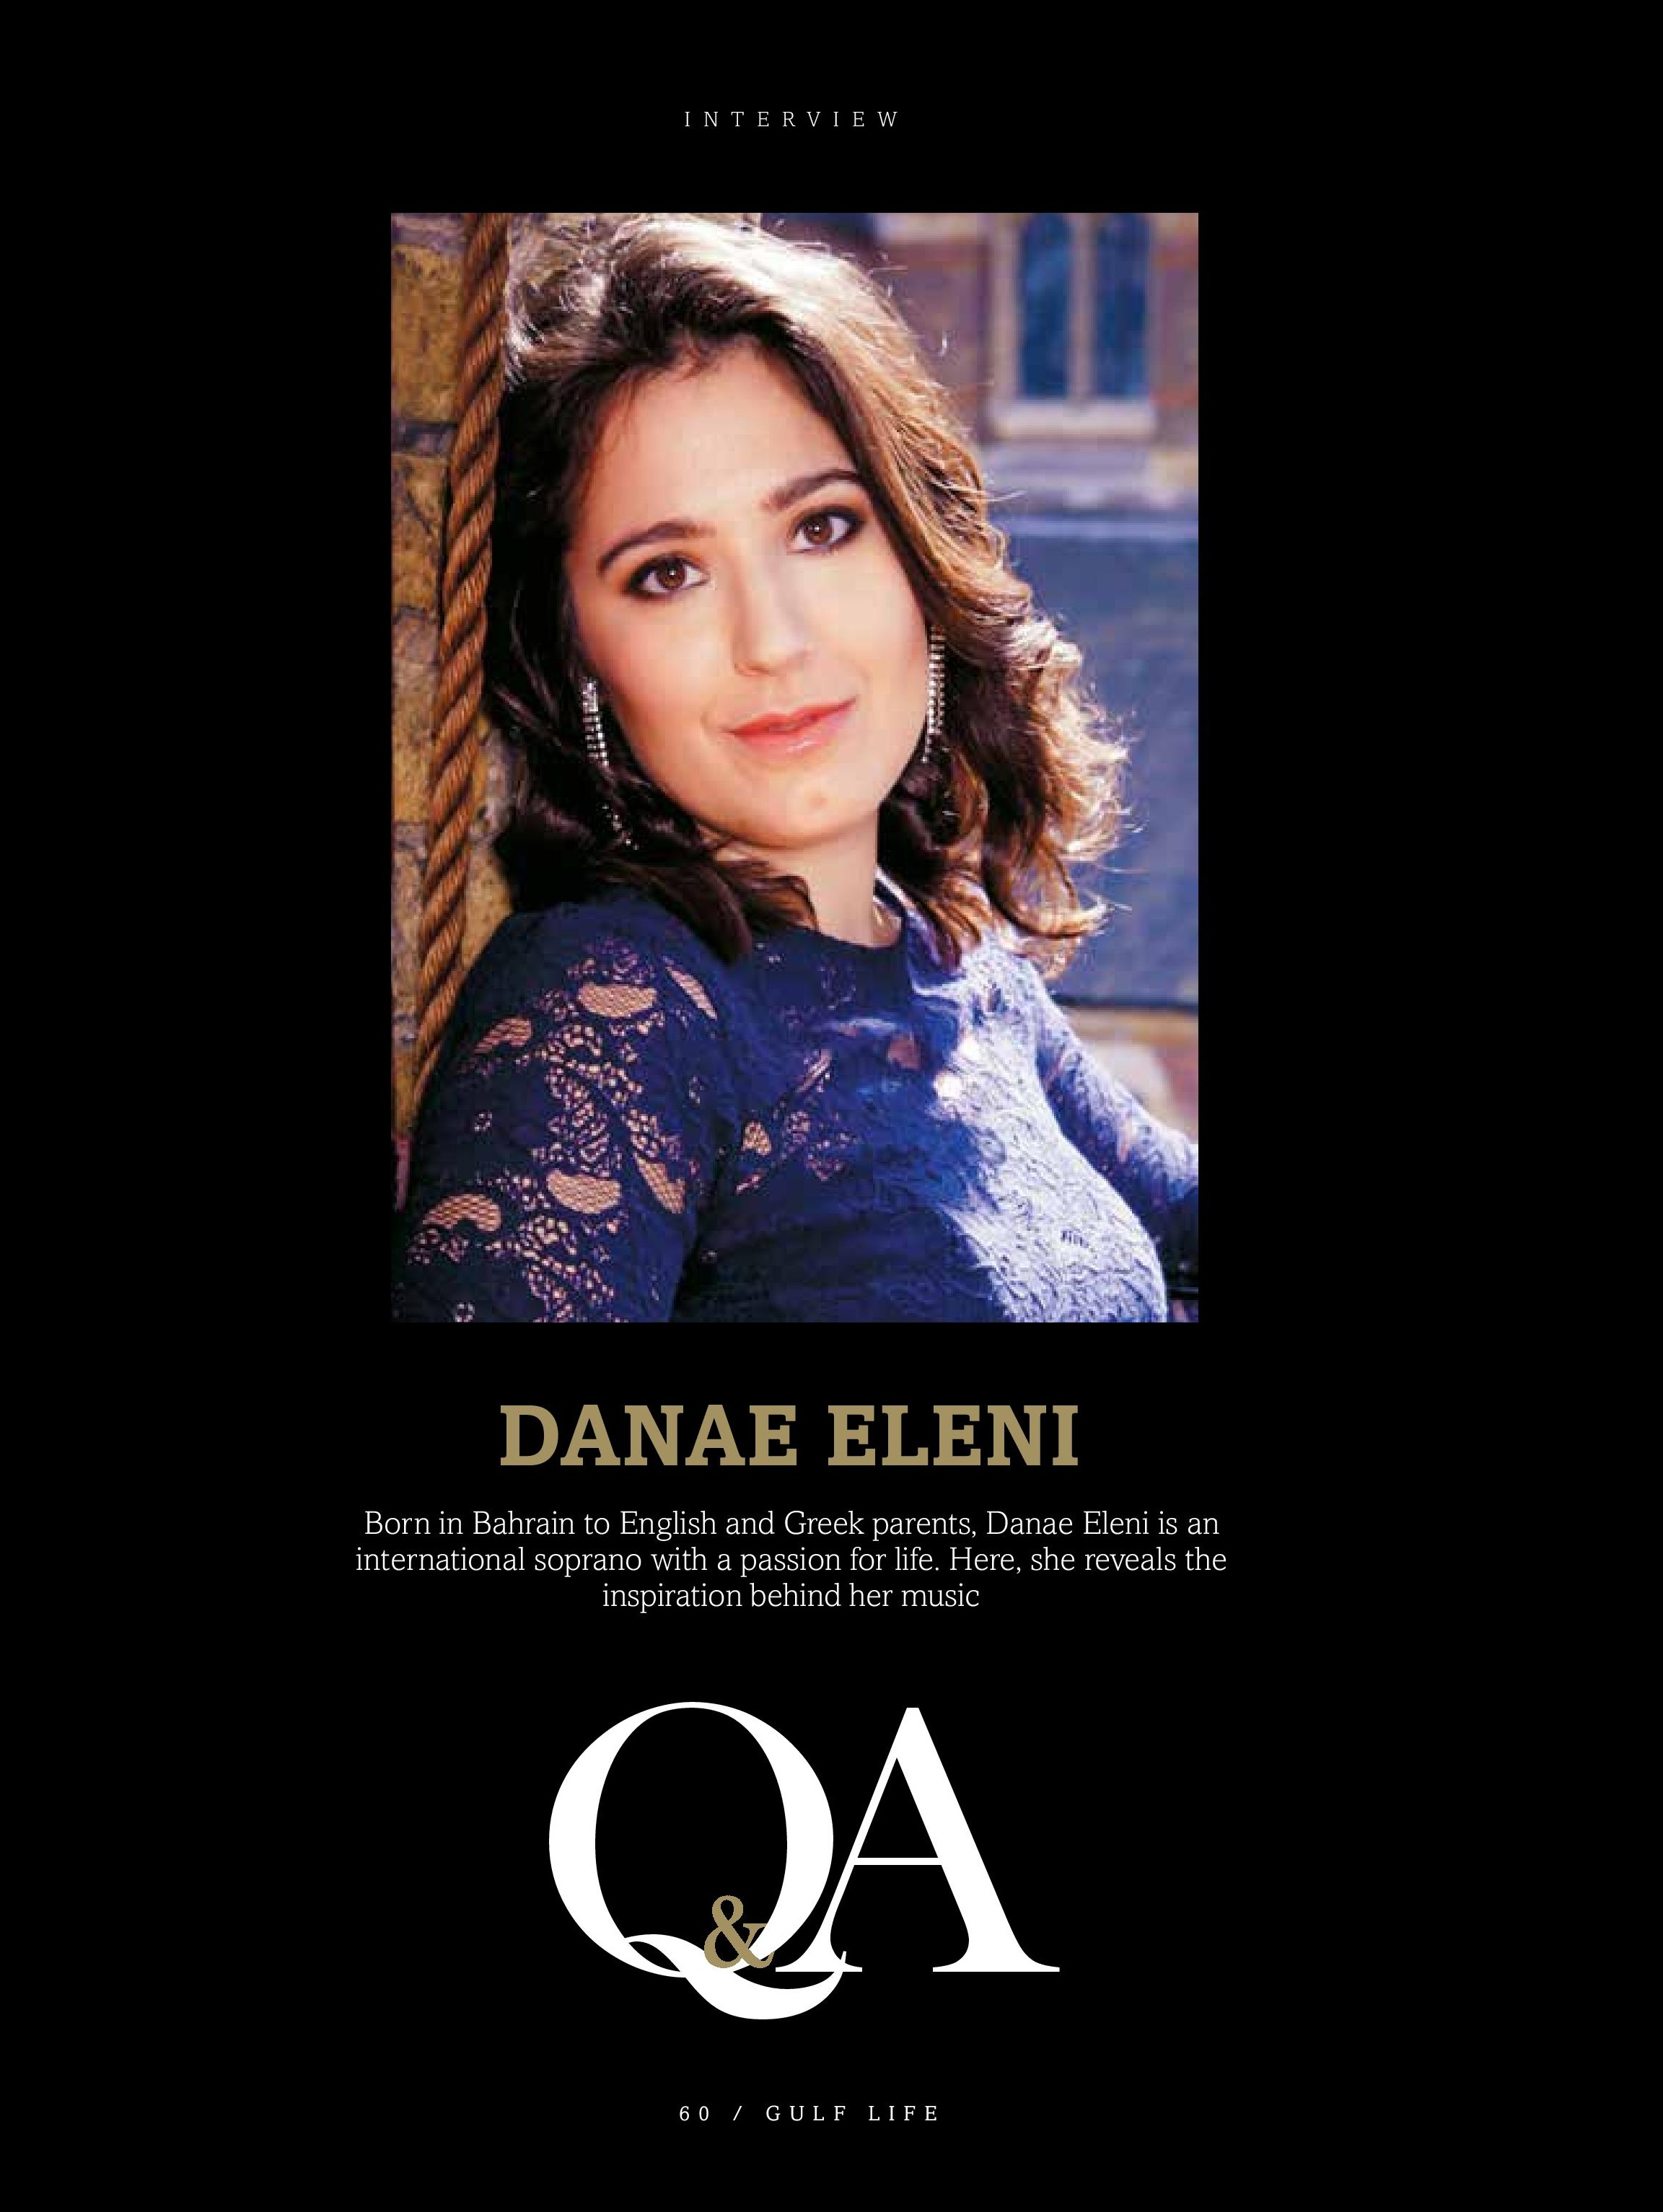 Danae Eleni Gulf Life Interview-page-60.jpg